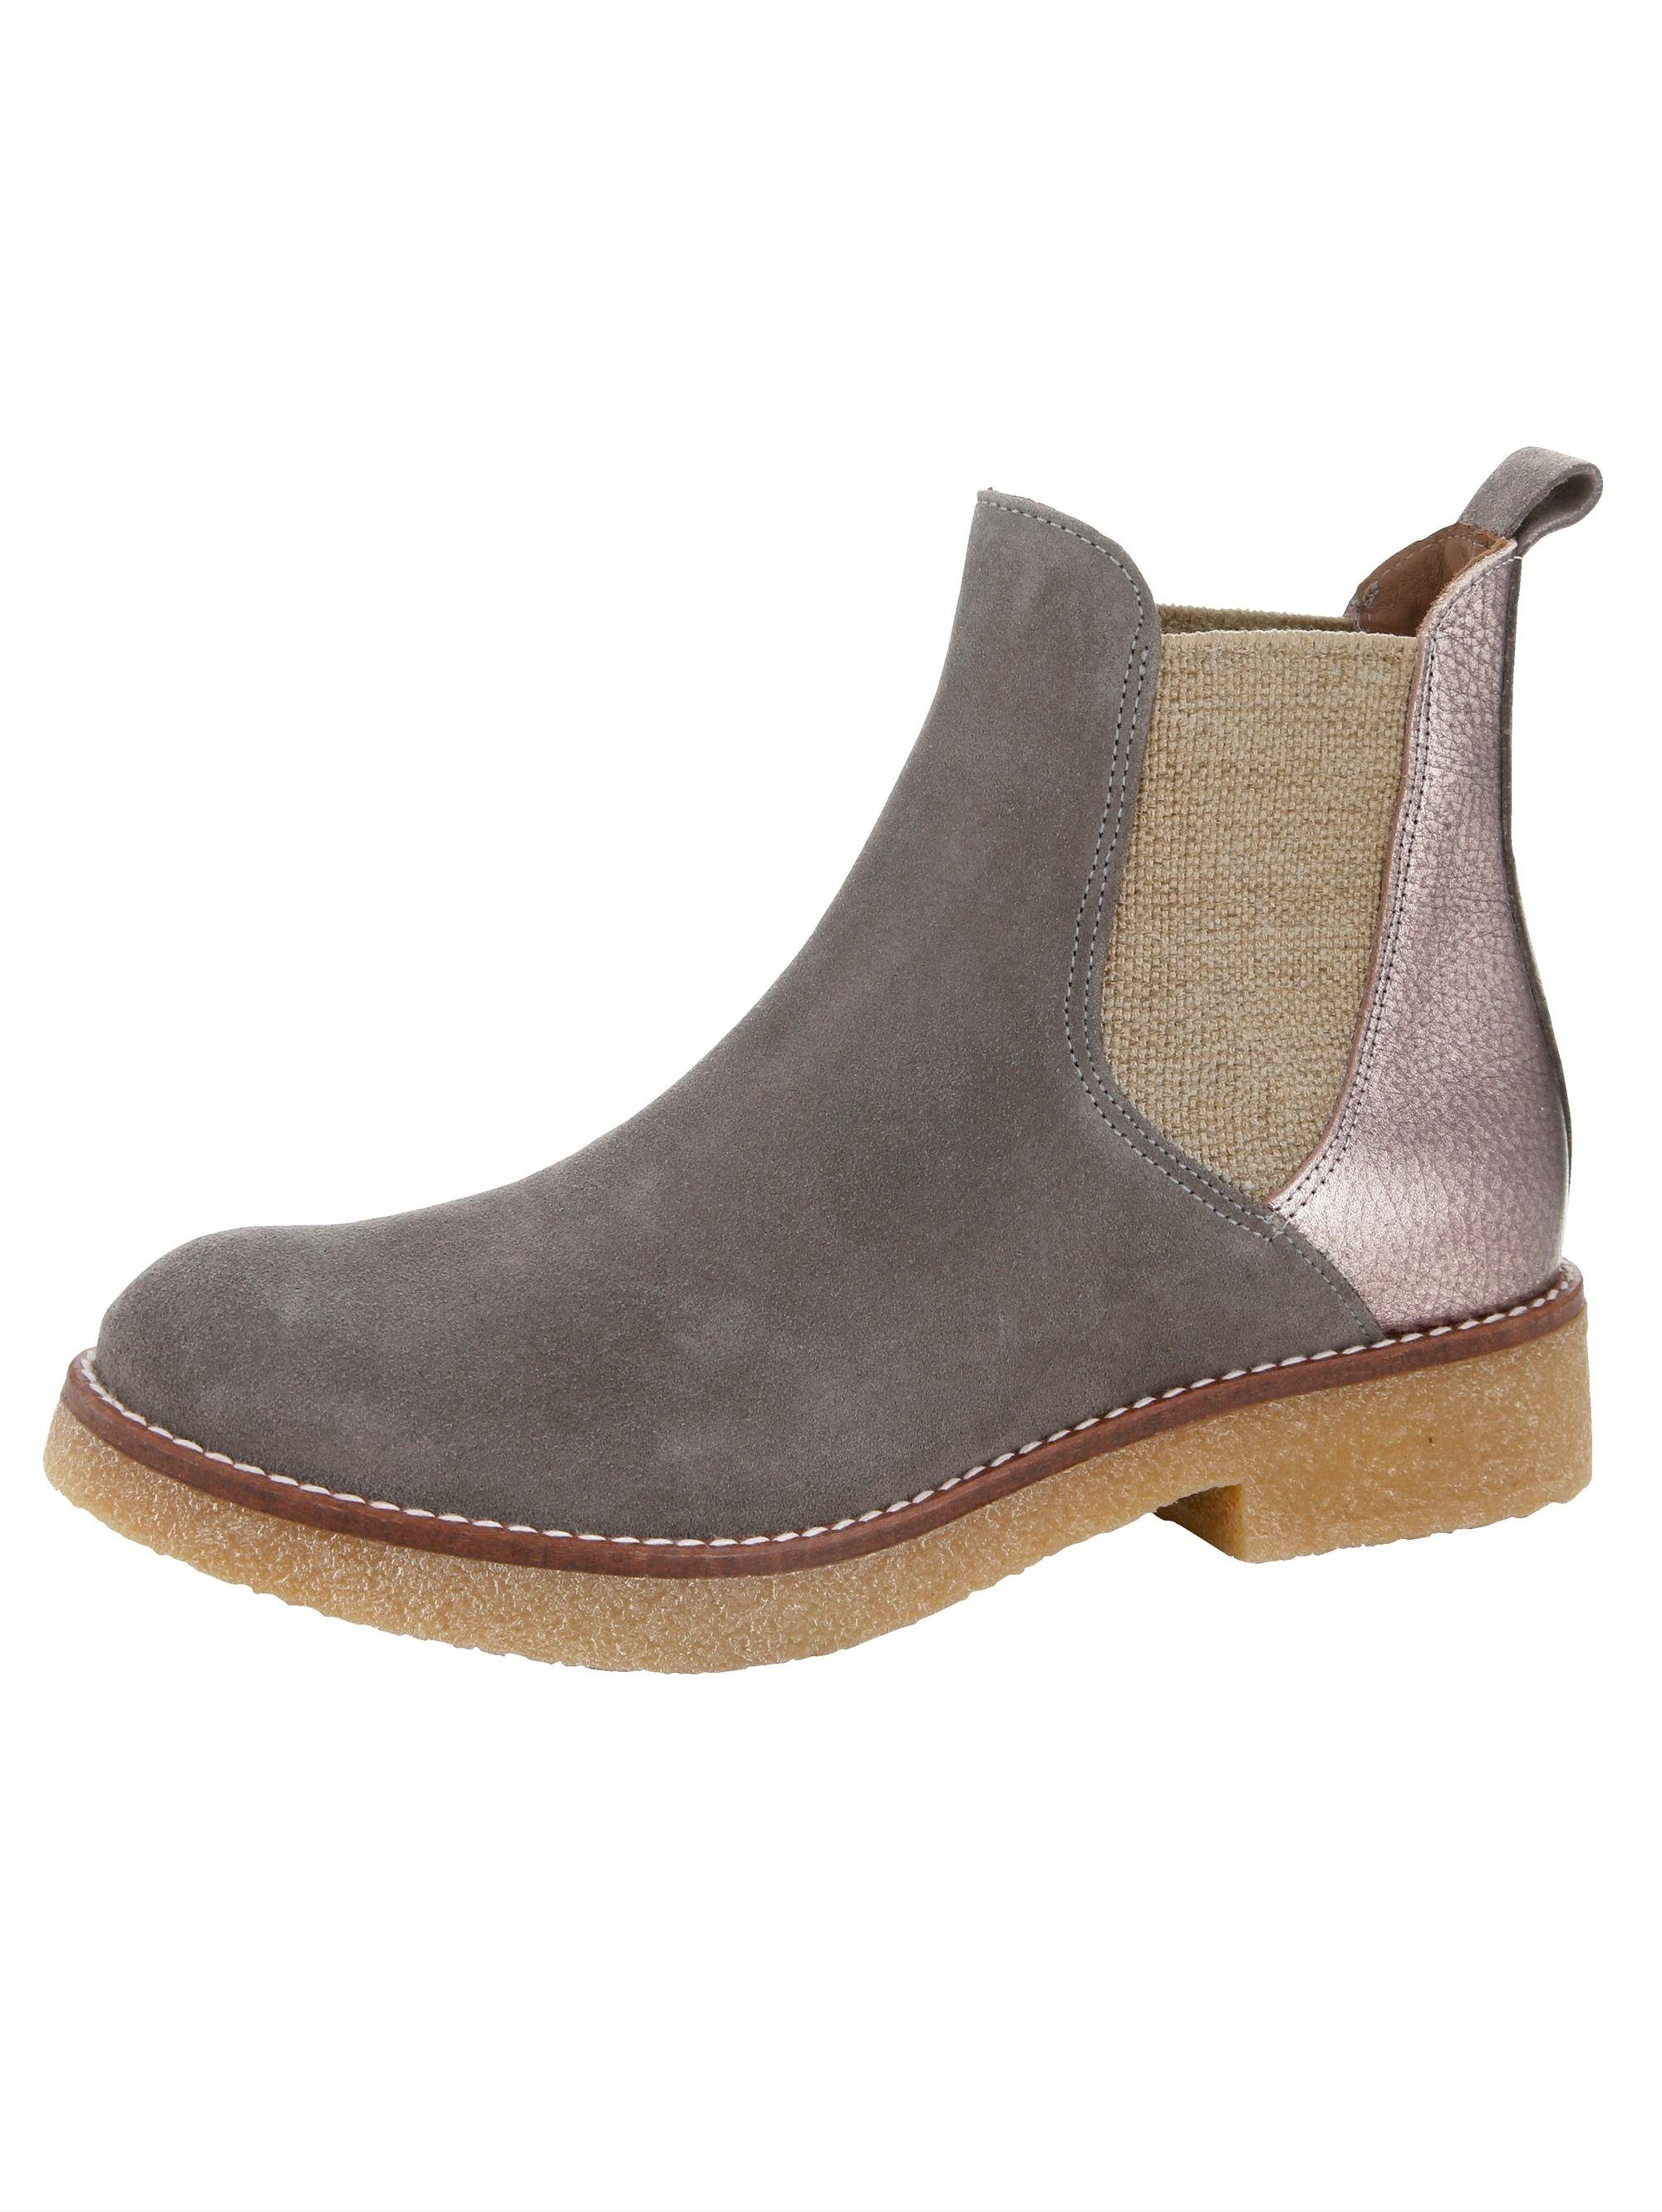 Boot Alba Moda marine KLgsICuE